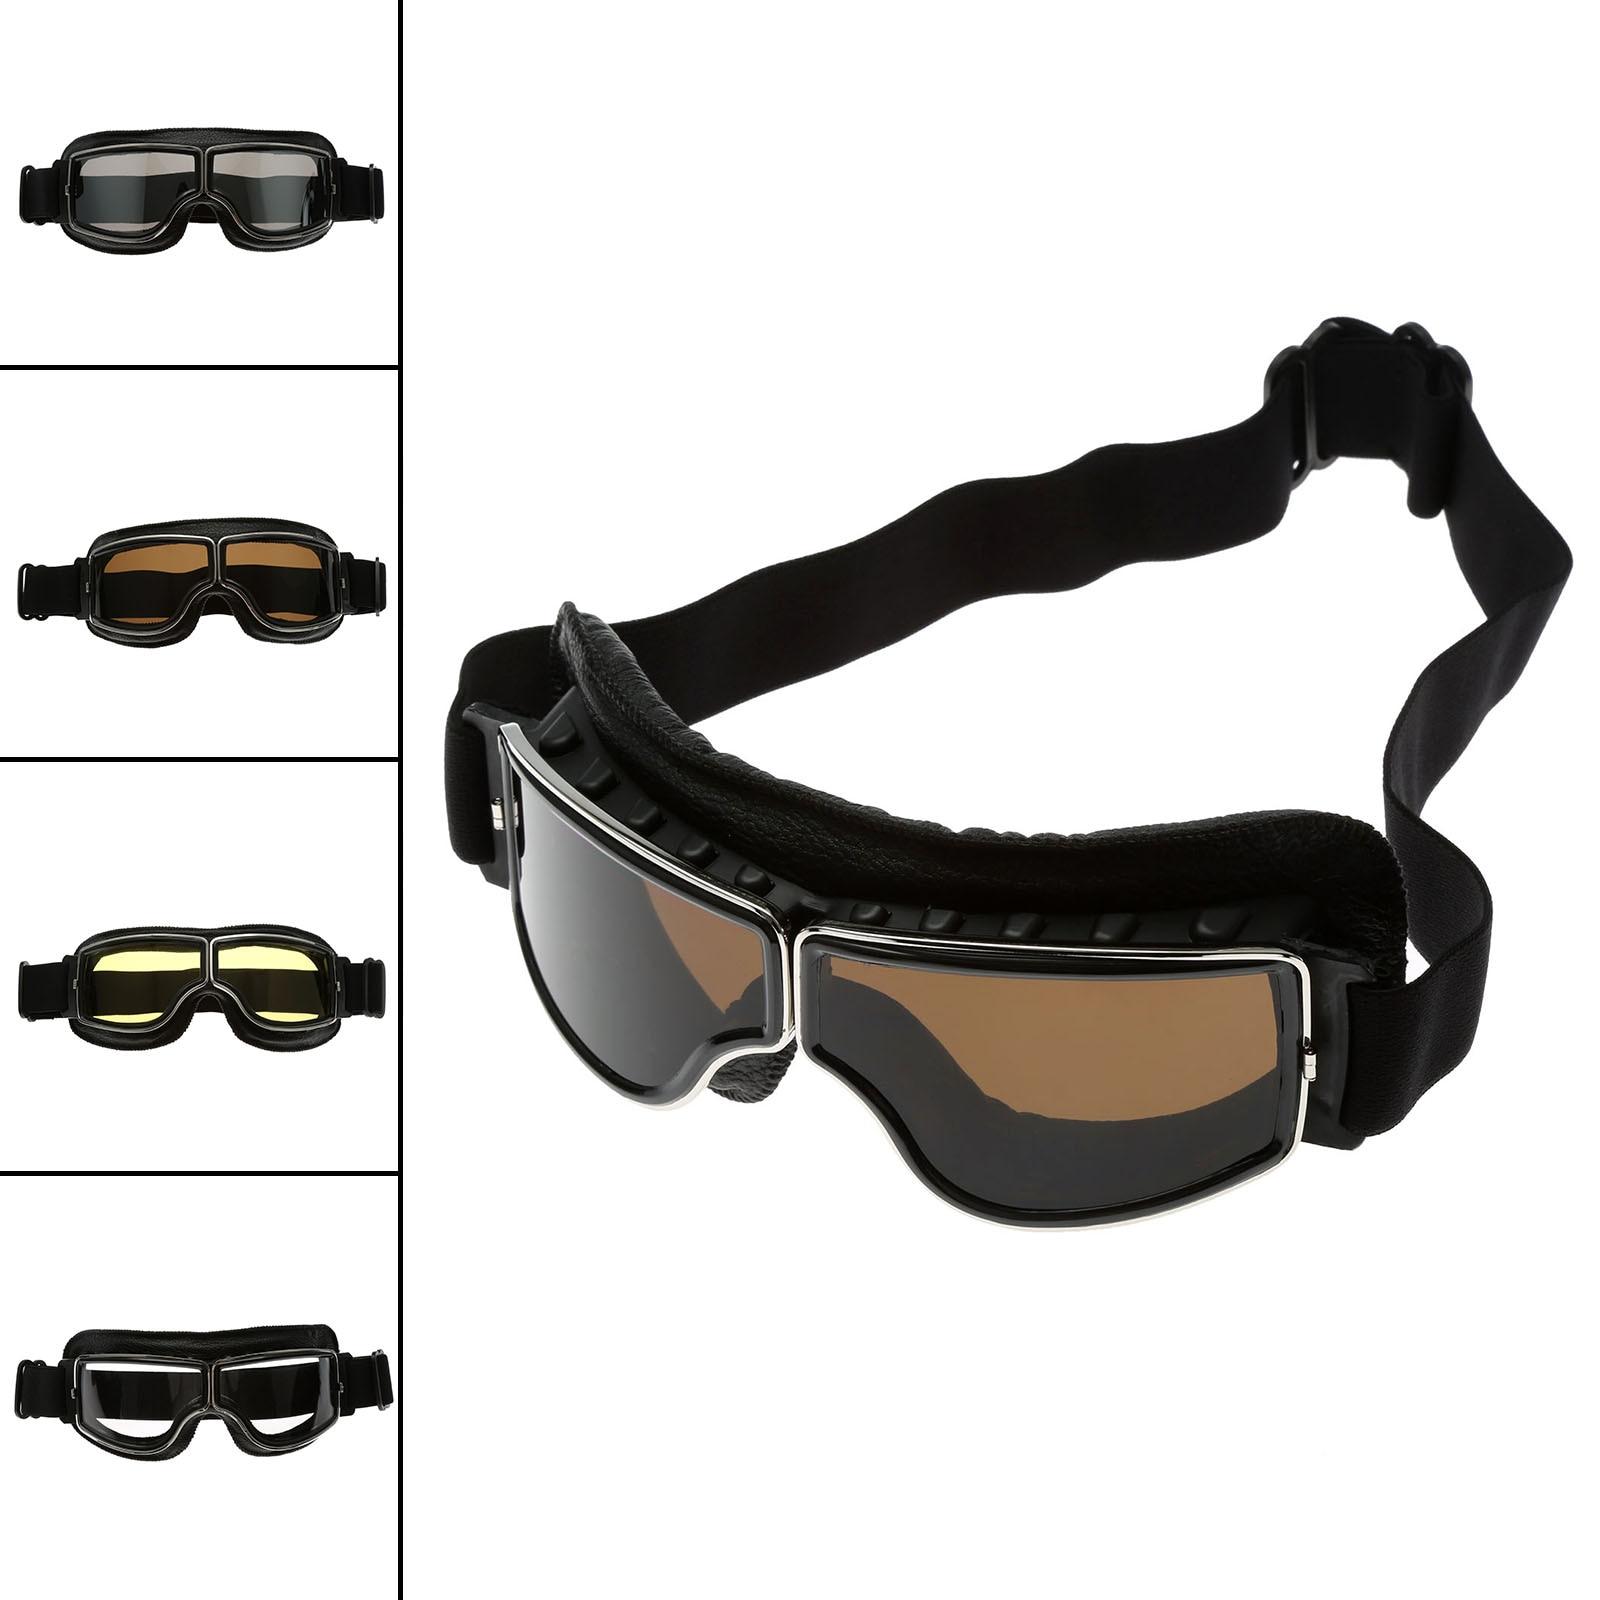 Retro gafas de moto para Harley motocross casco Gafas protección UV ski snowboard skate gafas retro cuero lente